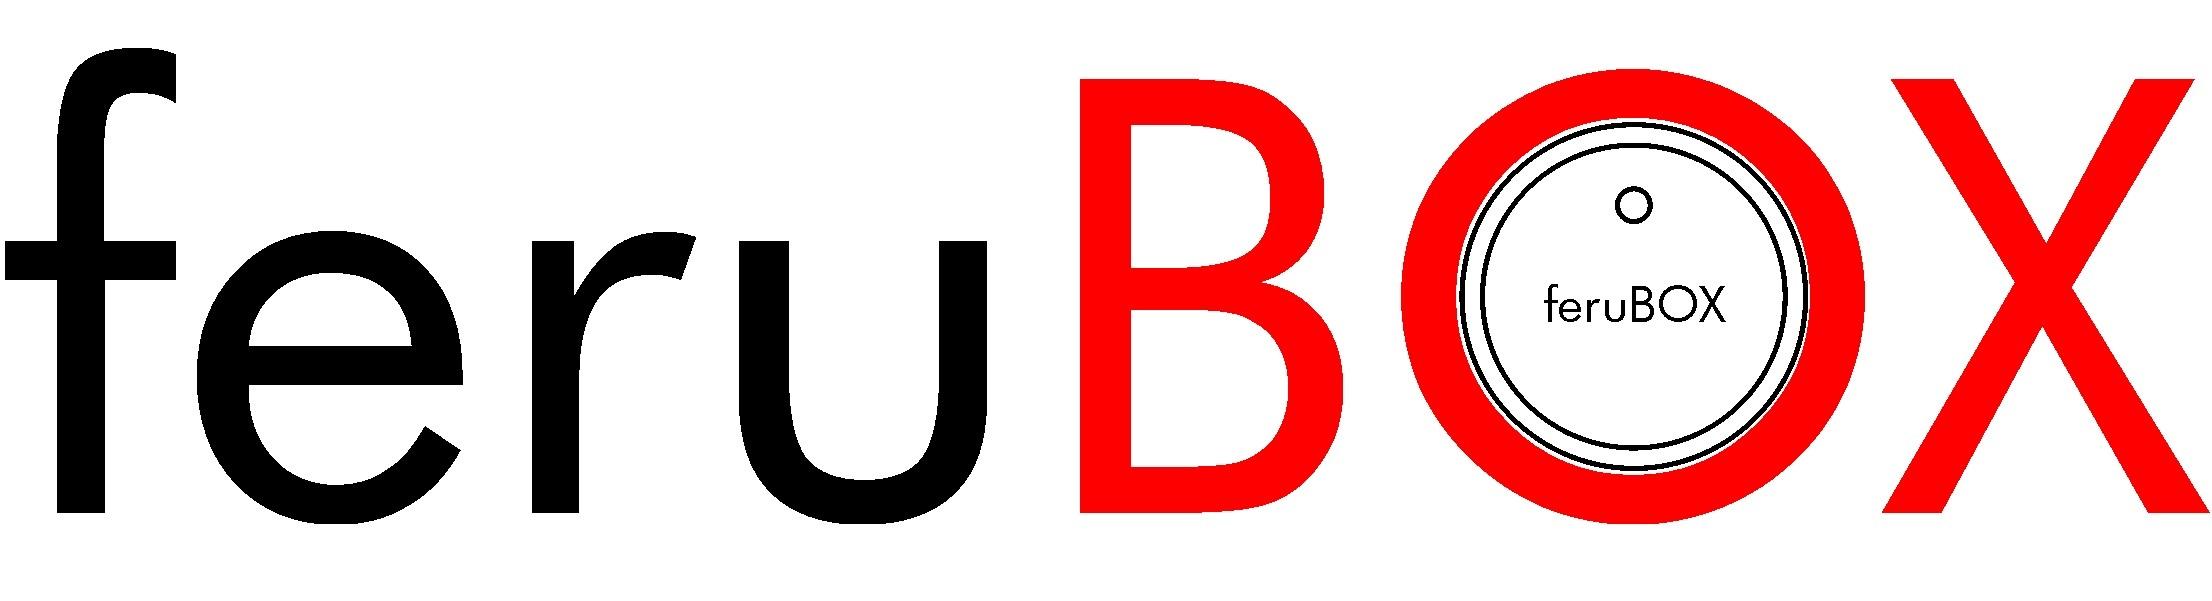 FeruBOX